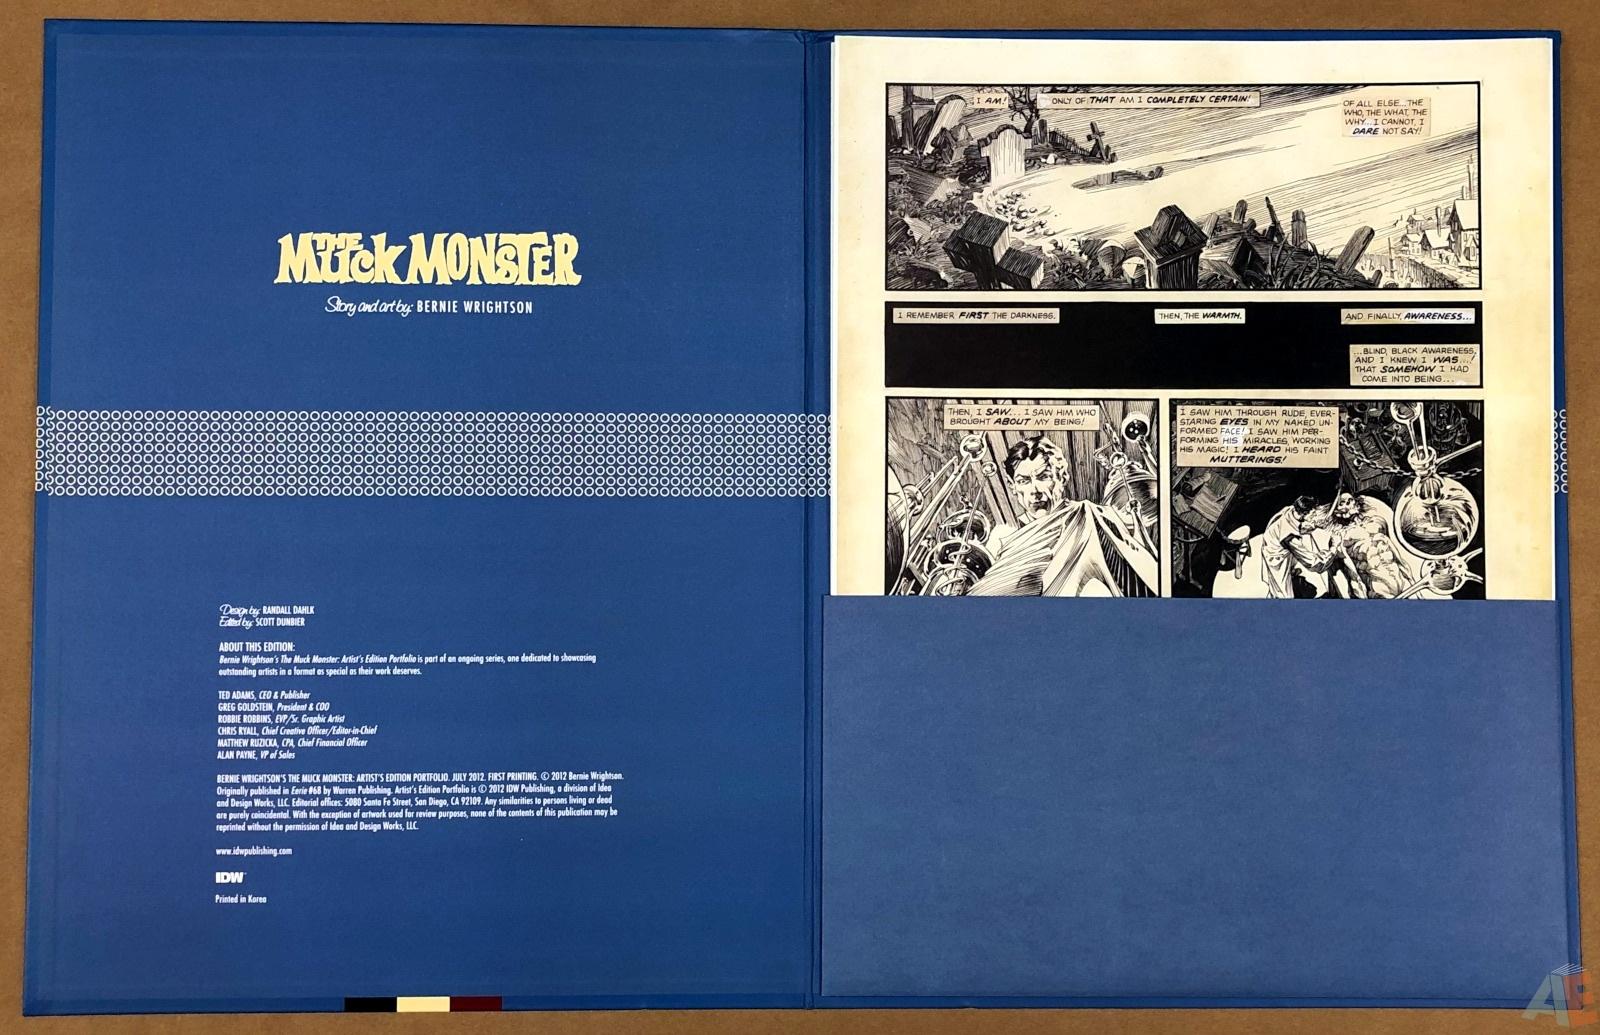 Bernie Wrightson's The Muck Monster: Artist's Edition Portfolio